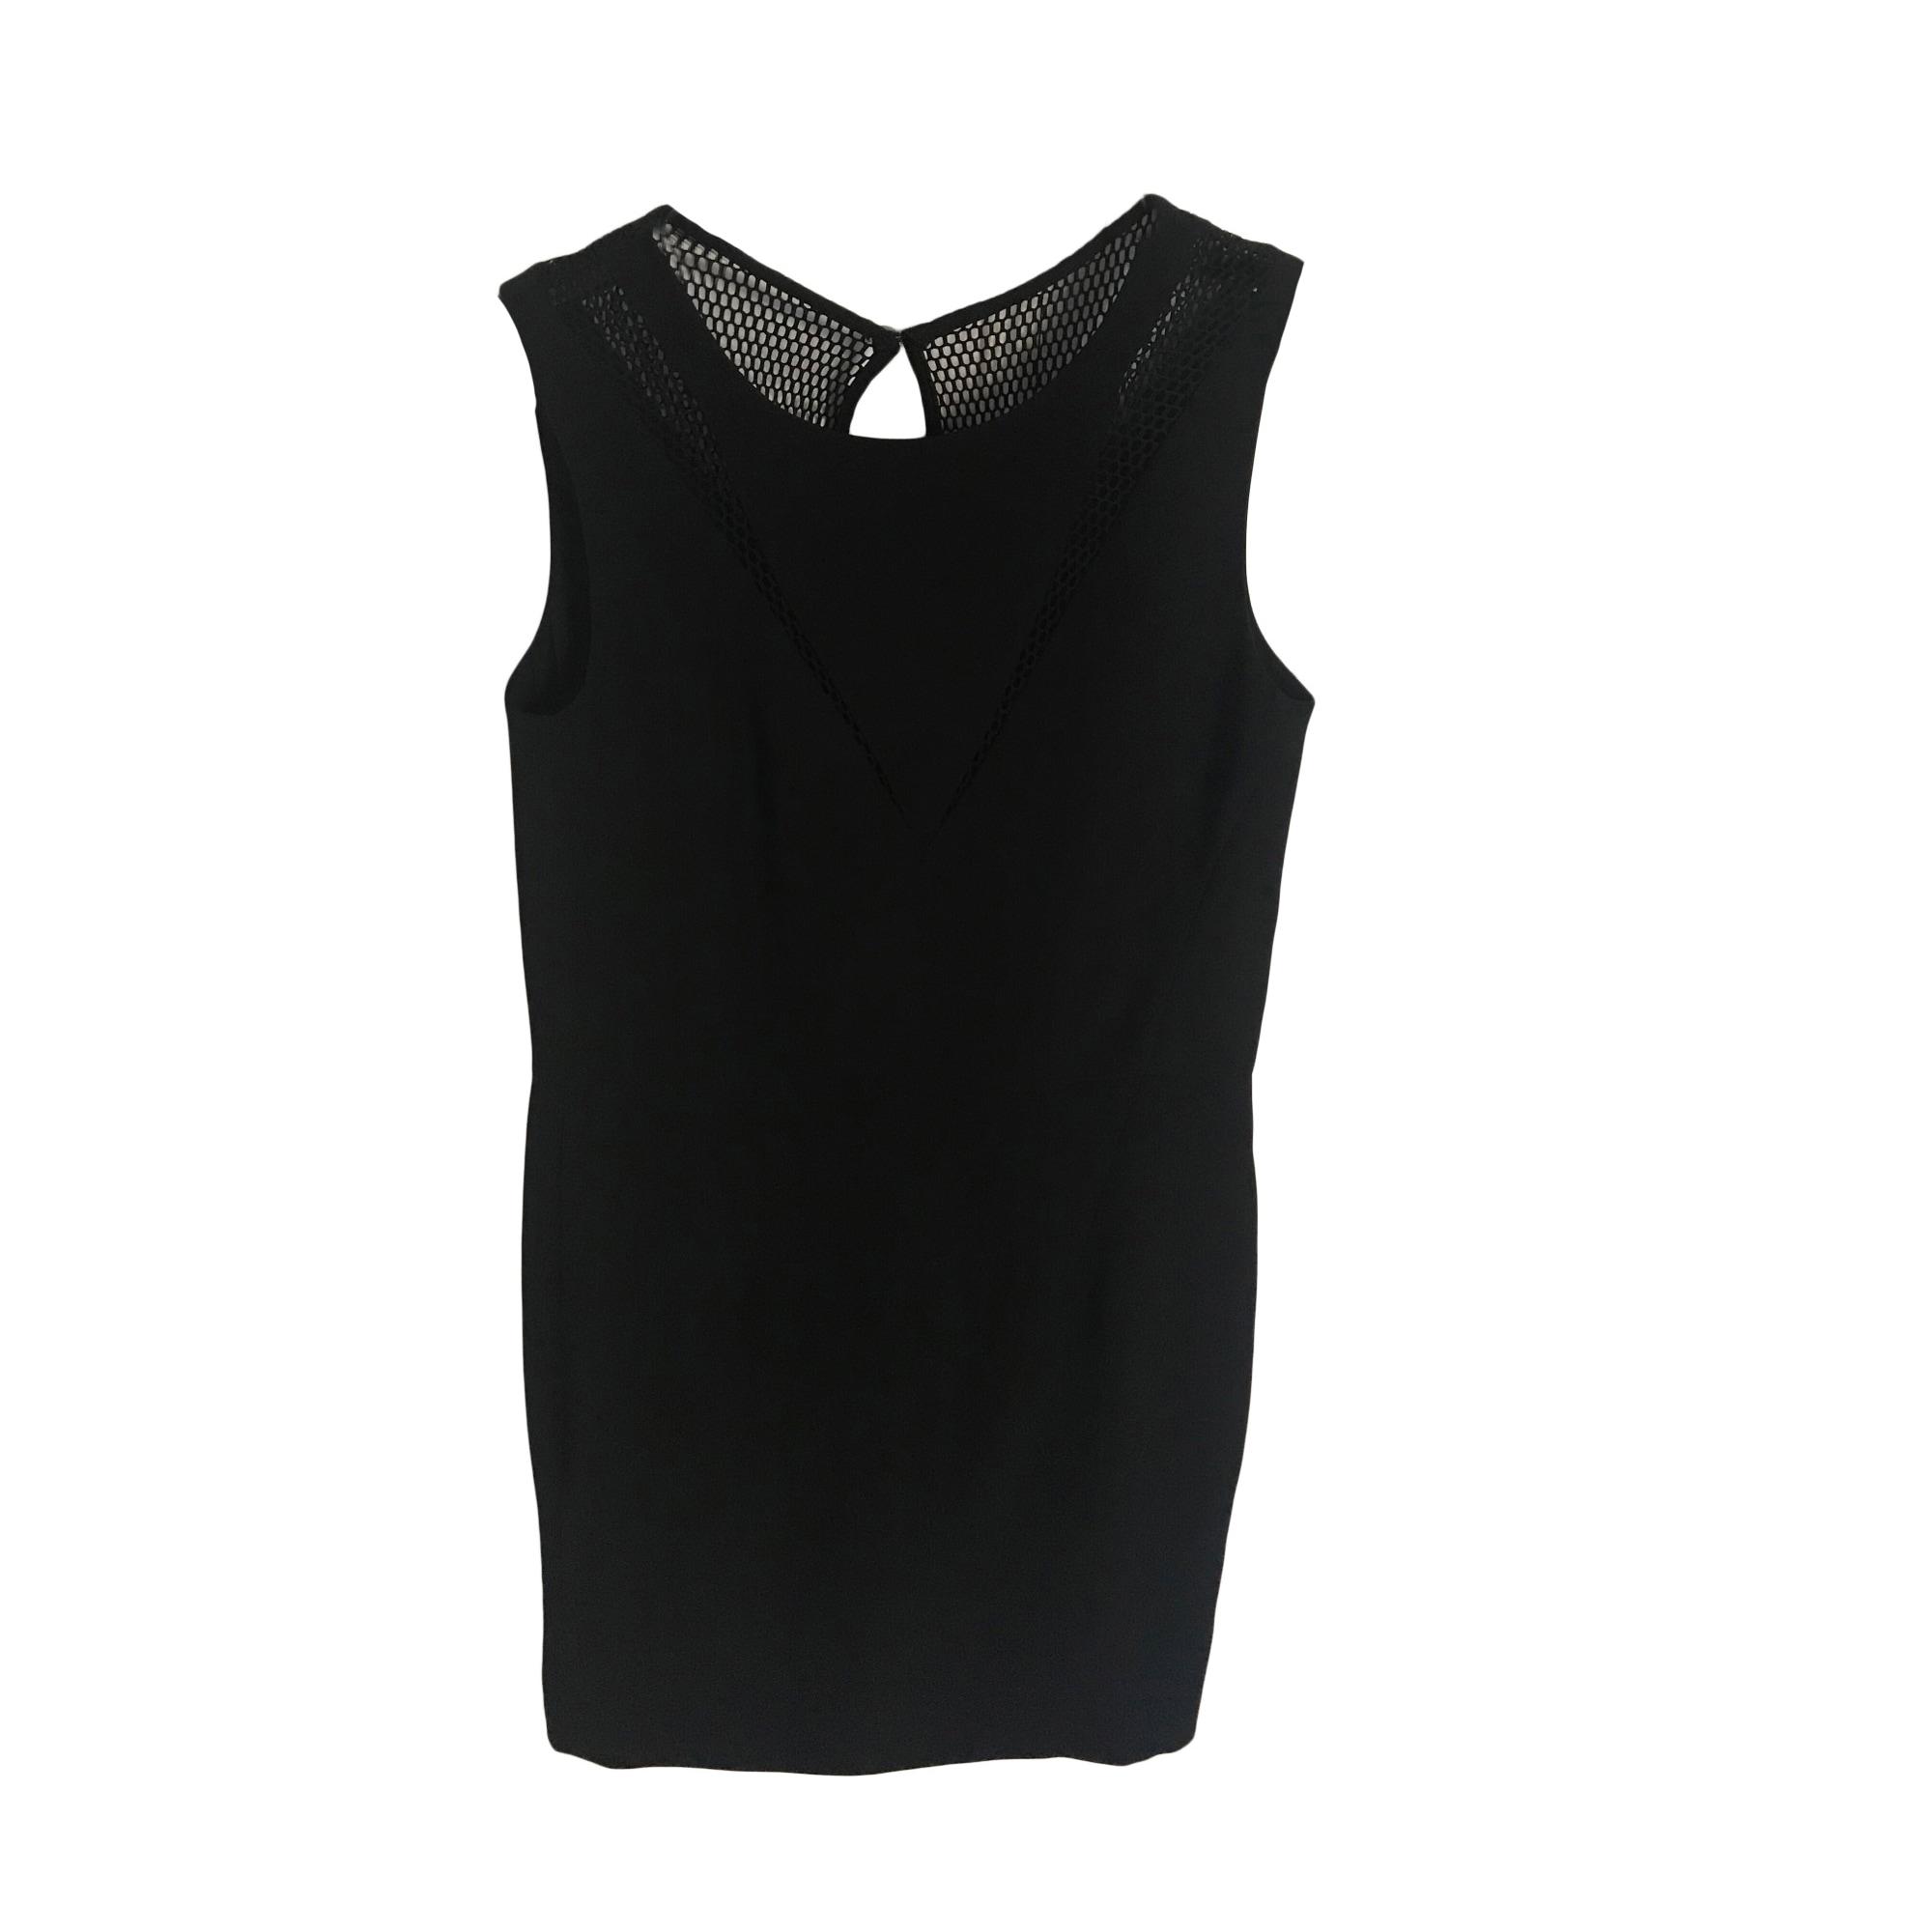 Robe mi-longue PABLO PAR GÉRARD DAREL Noir